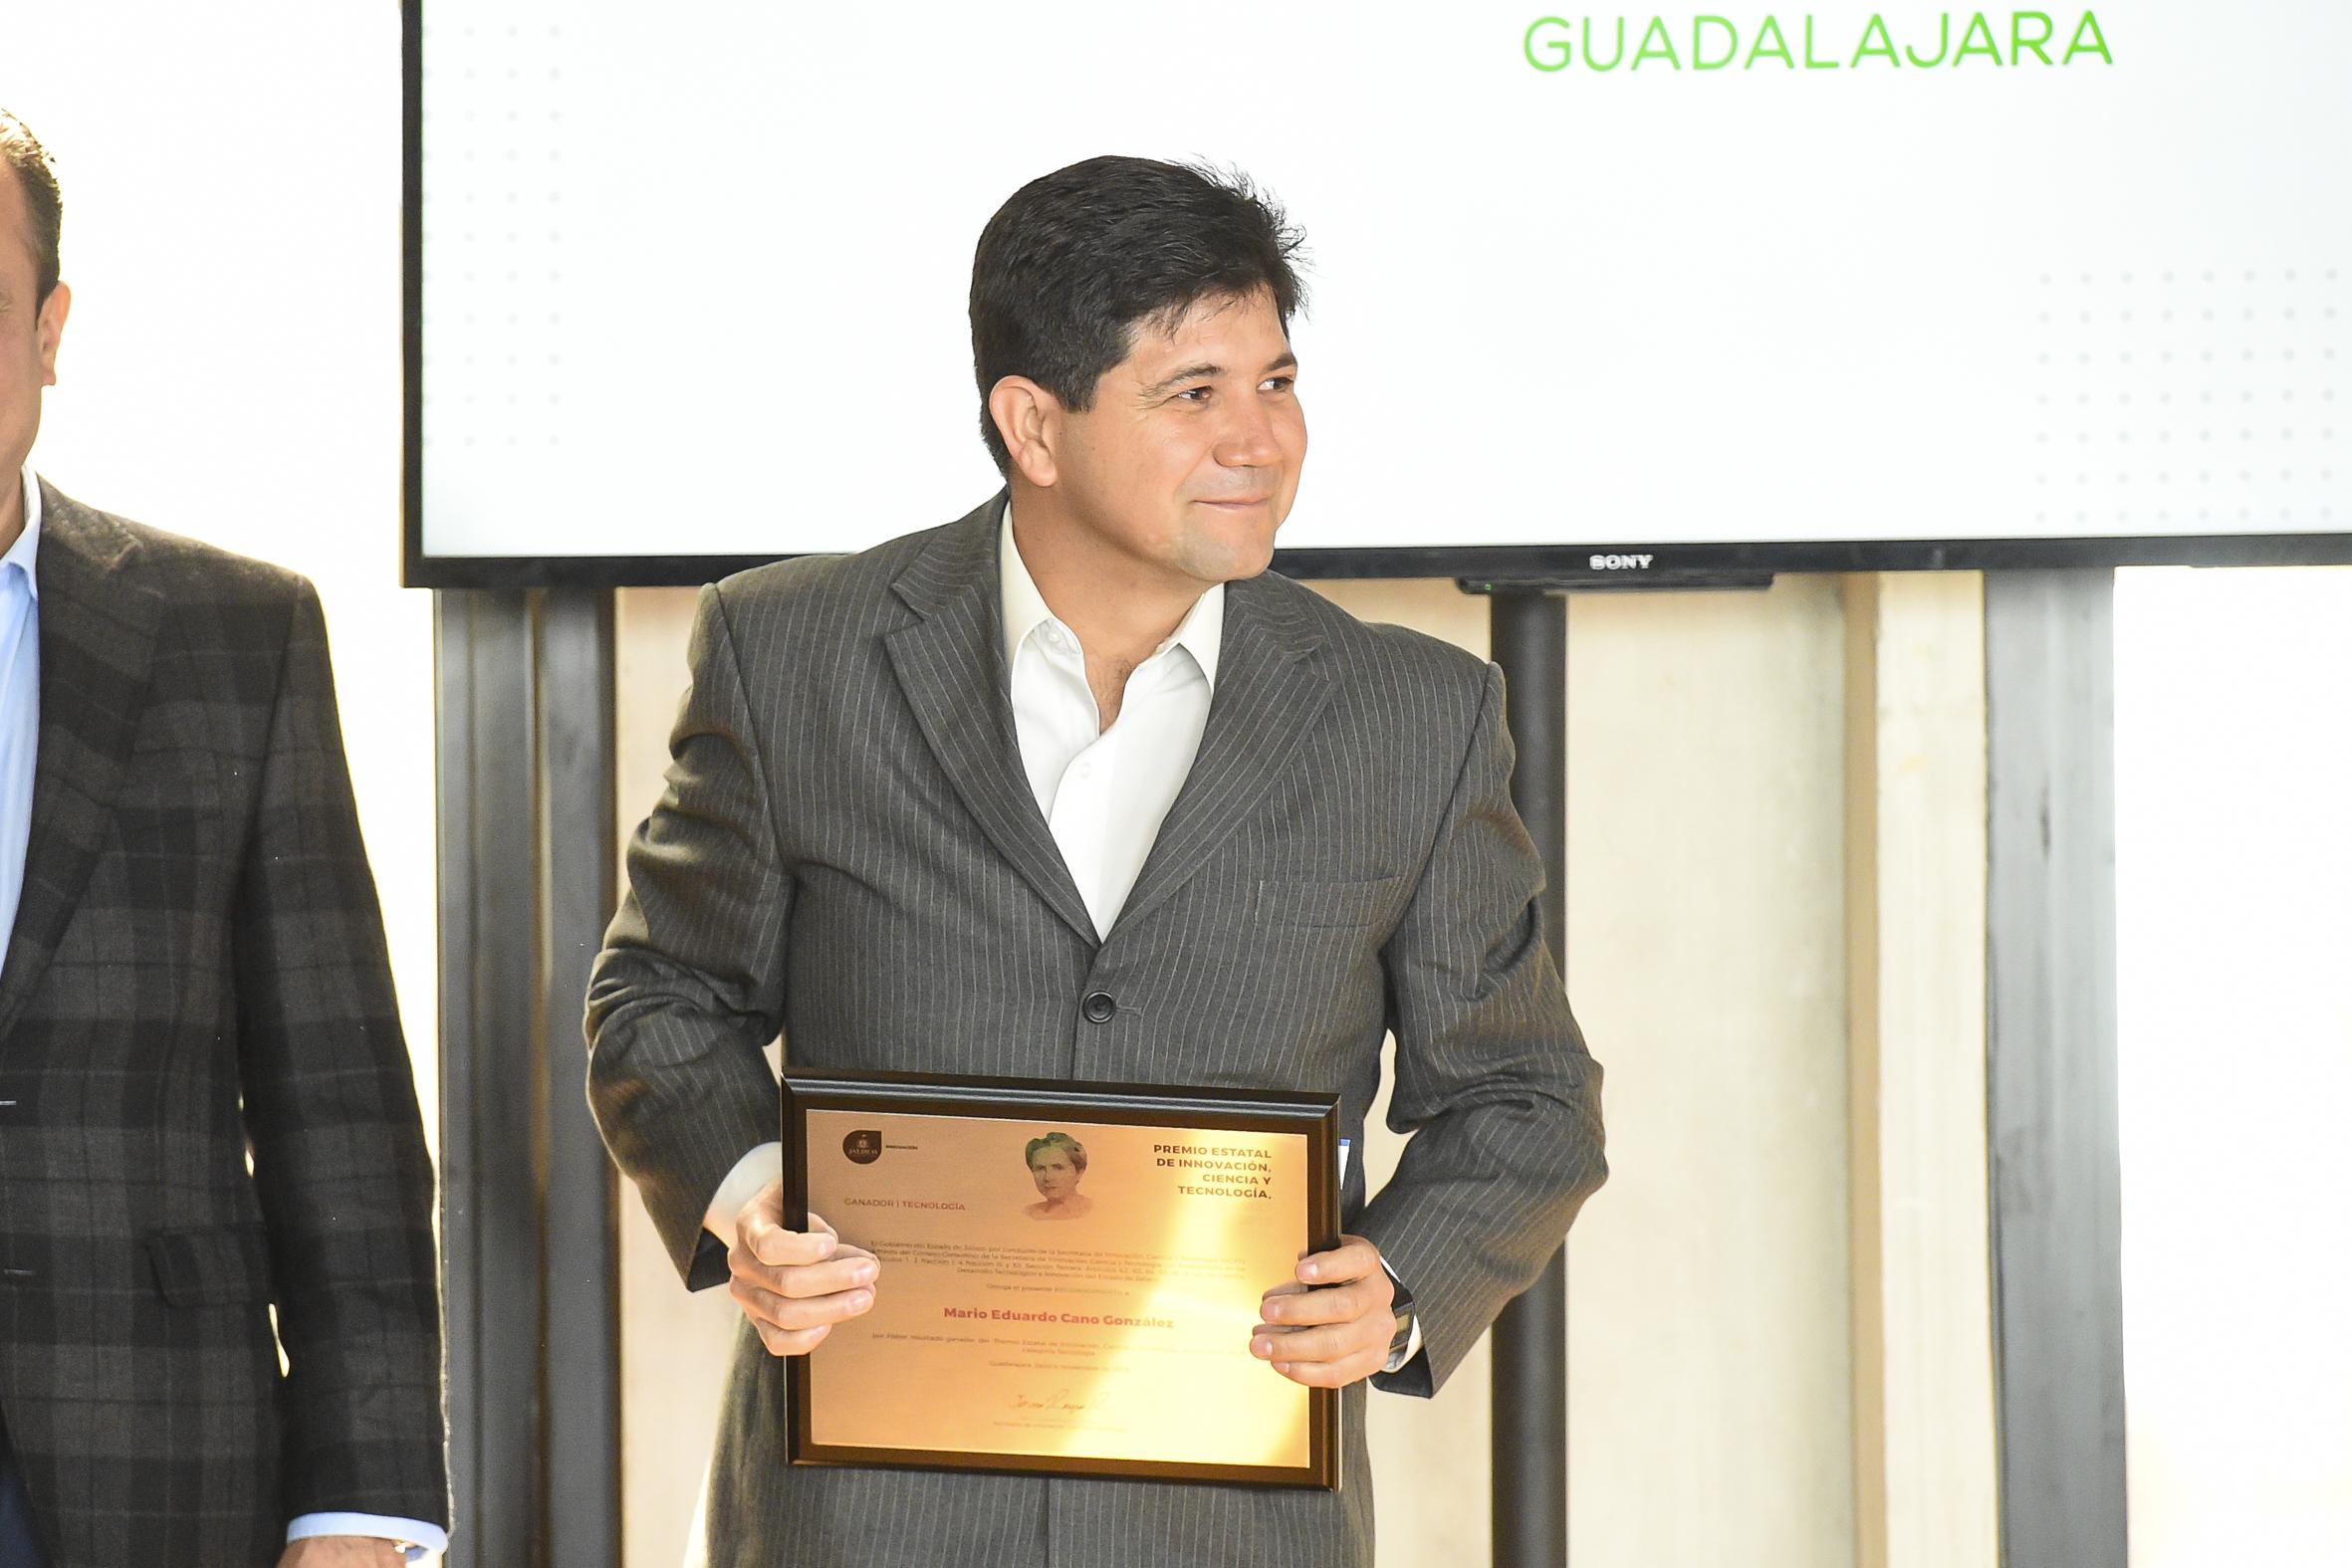 Dr. Mario Eduardo Cano González de CUValles posando para la foto